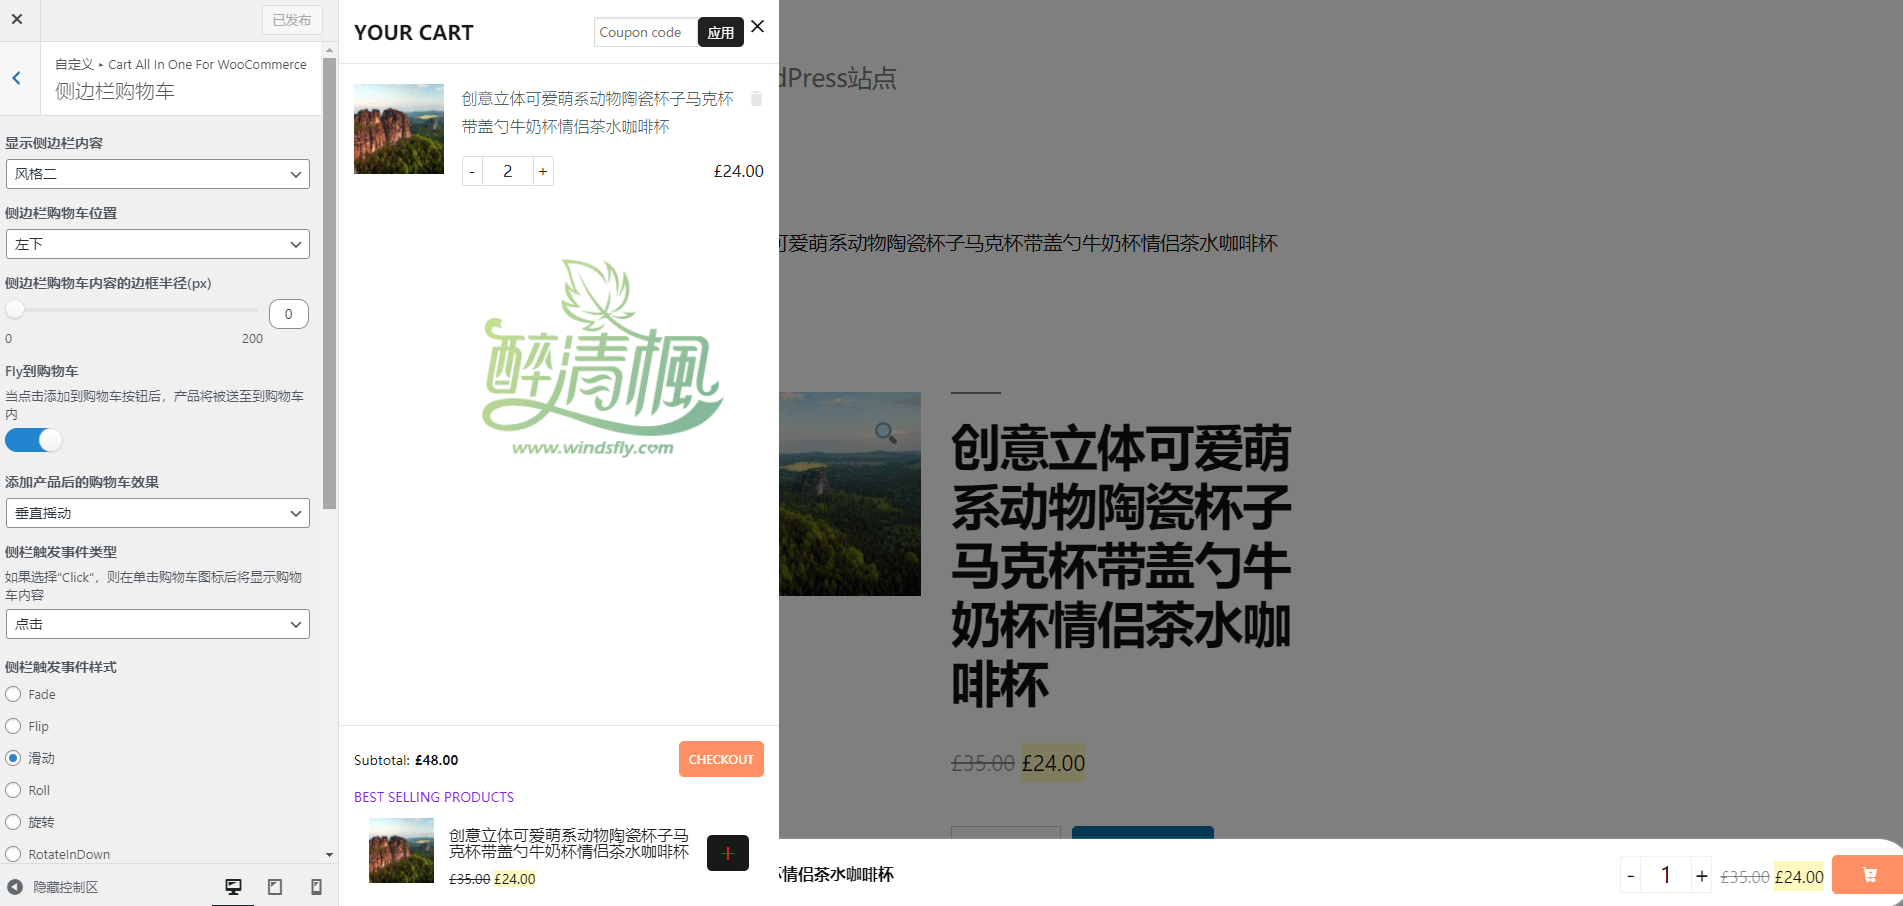 Woocommerce购物车多合一插件 - Cart All in One Premium(汉化)[更新至v1.0.1.8] WooCommerce插件 第3张